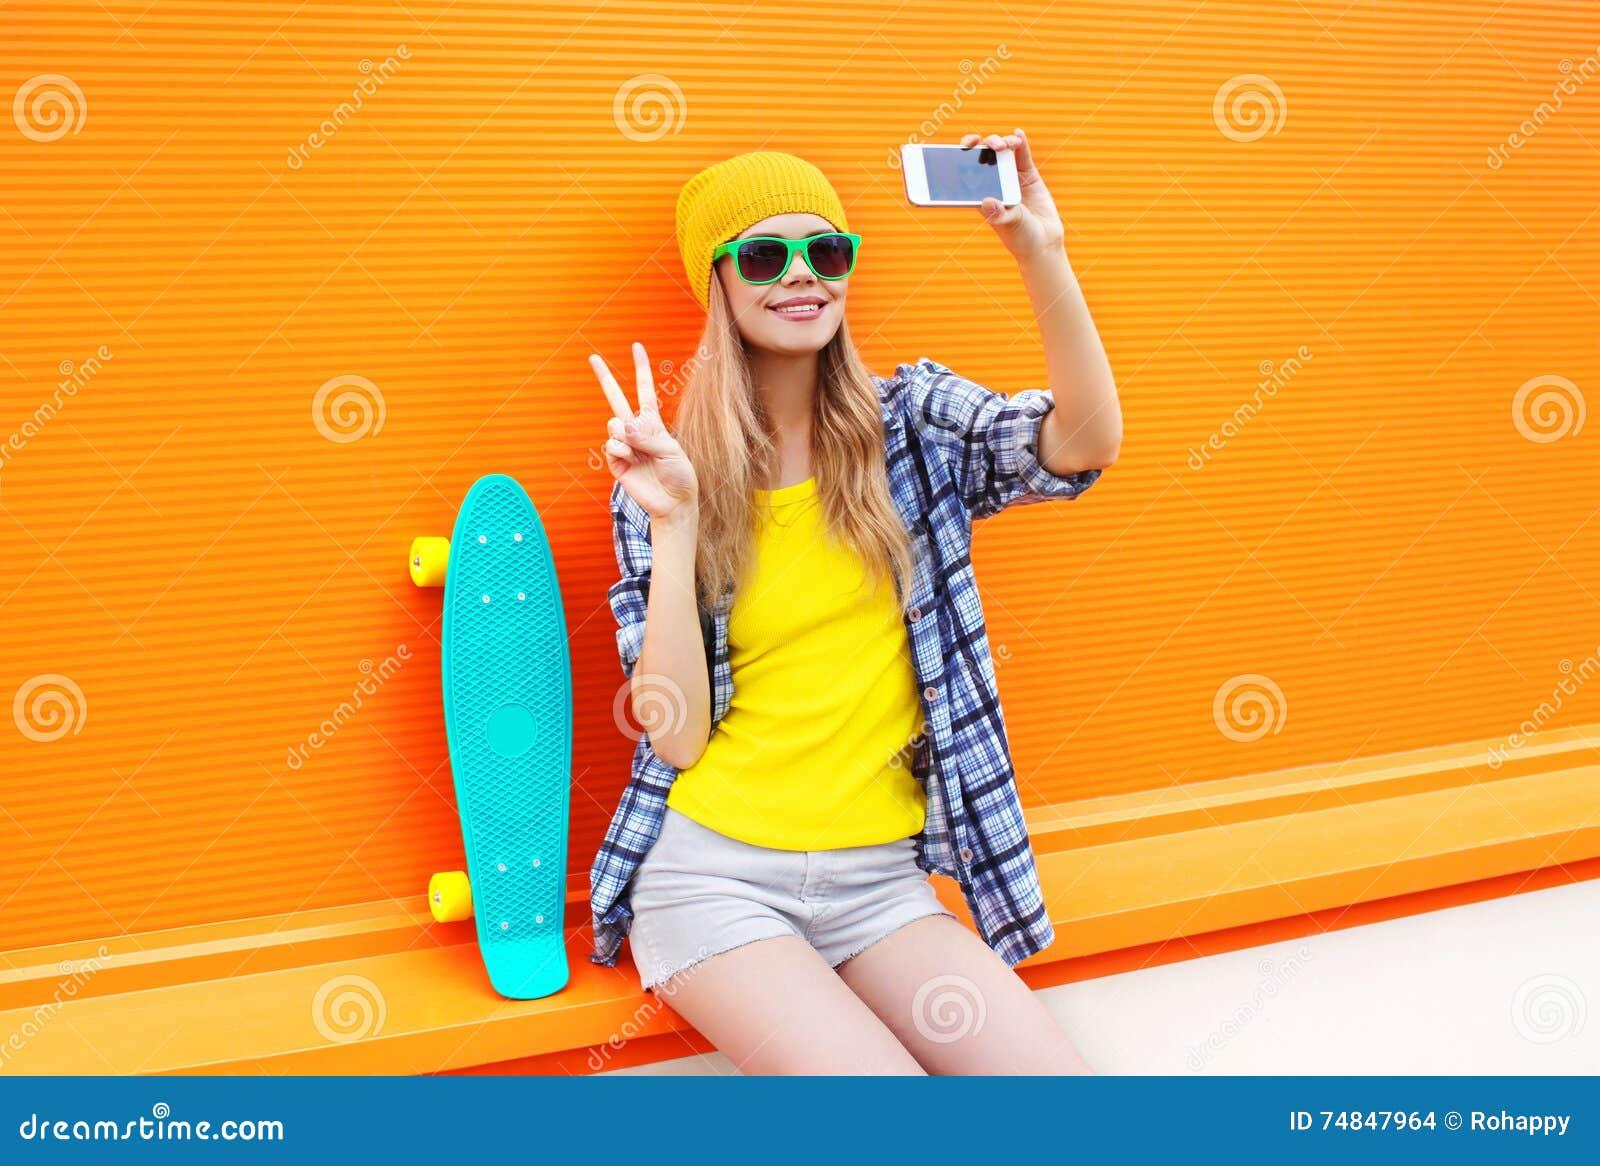 Fashion pretty cool girl makes self portrait on smartphone over colorful orange